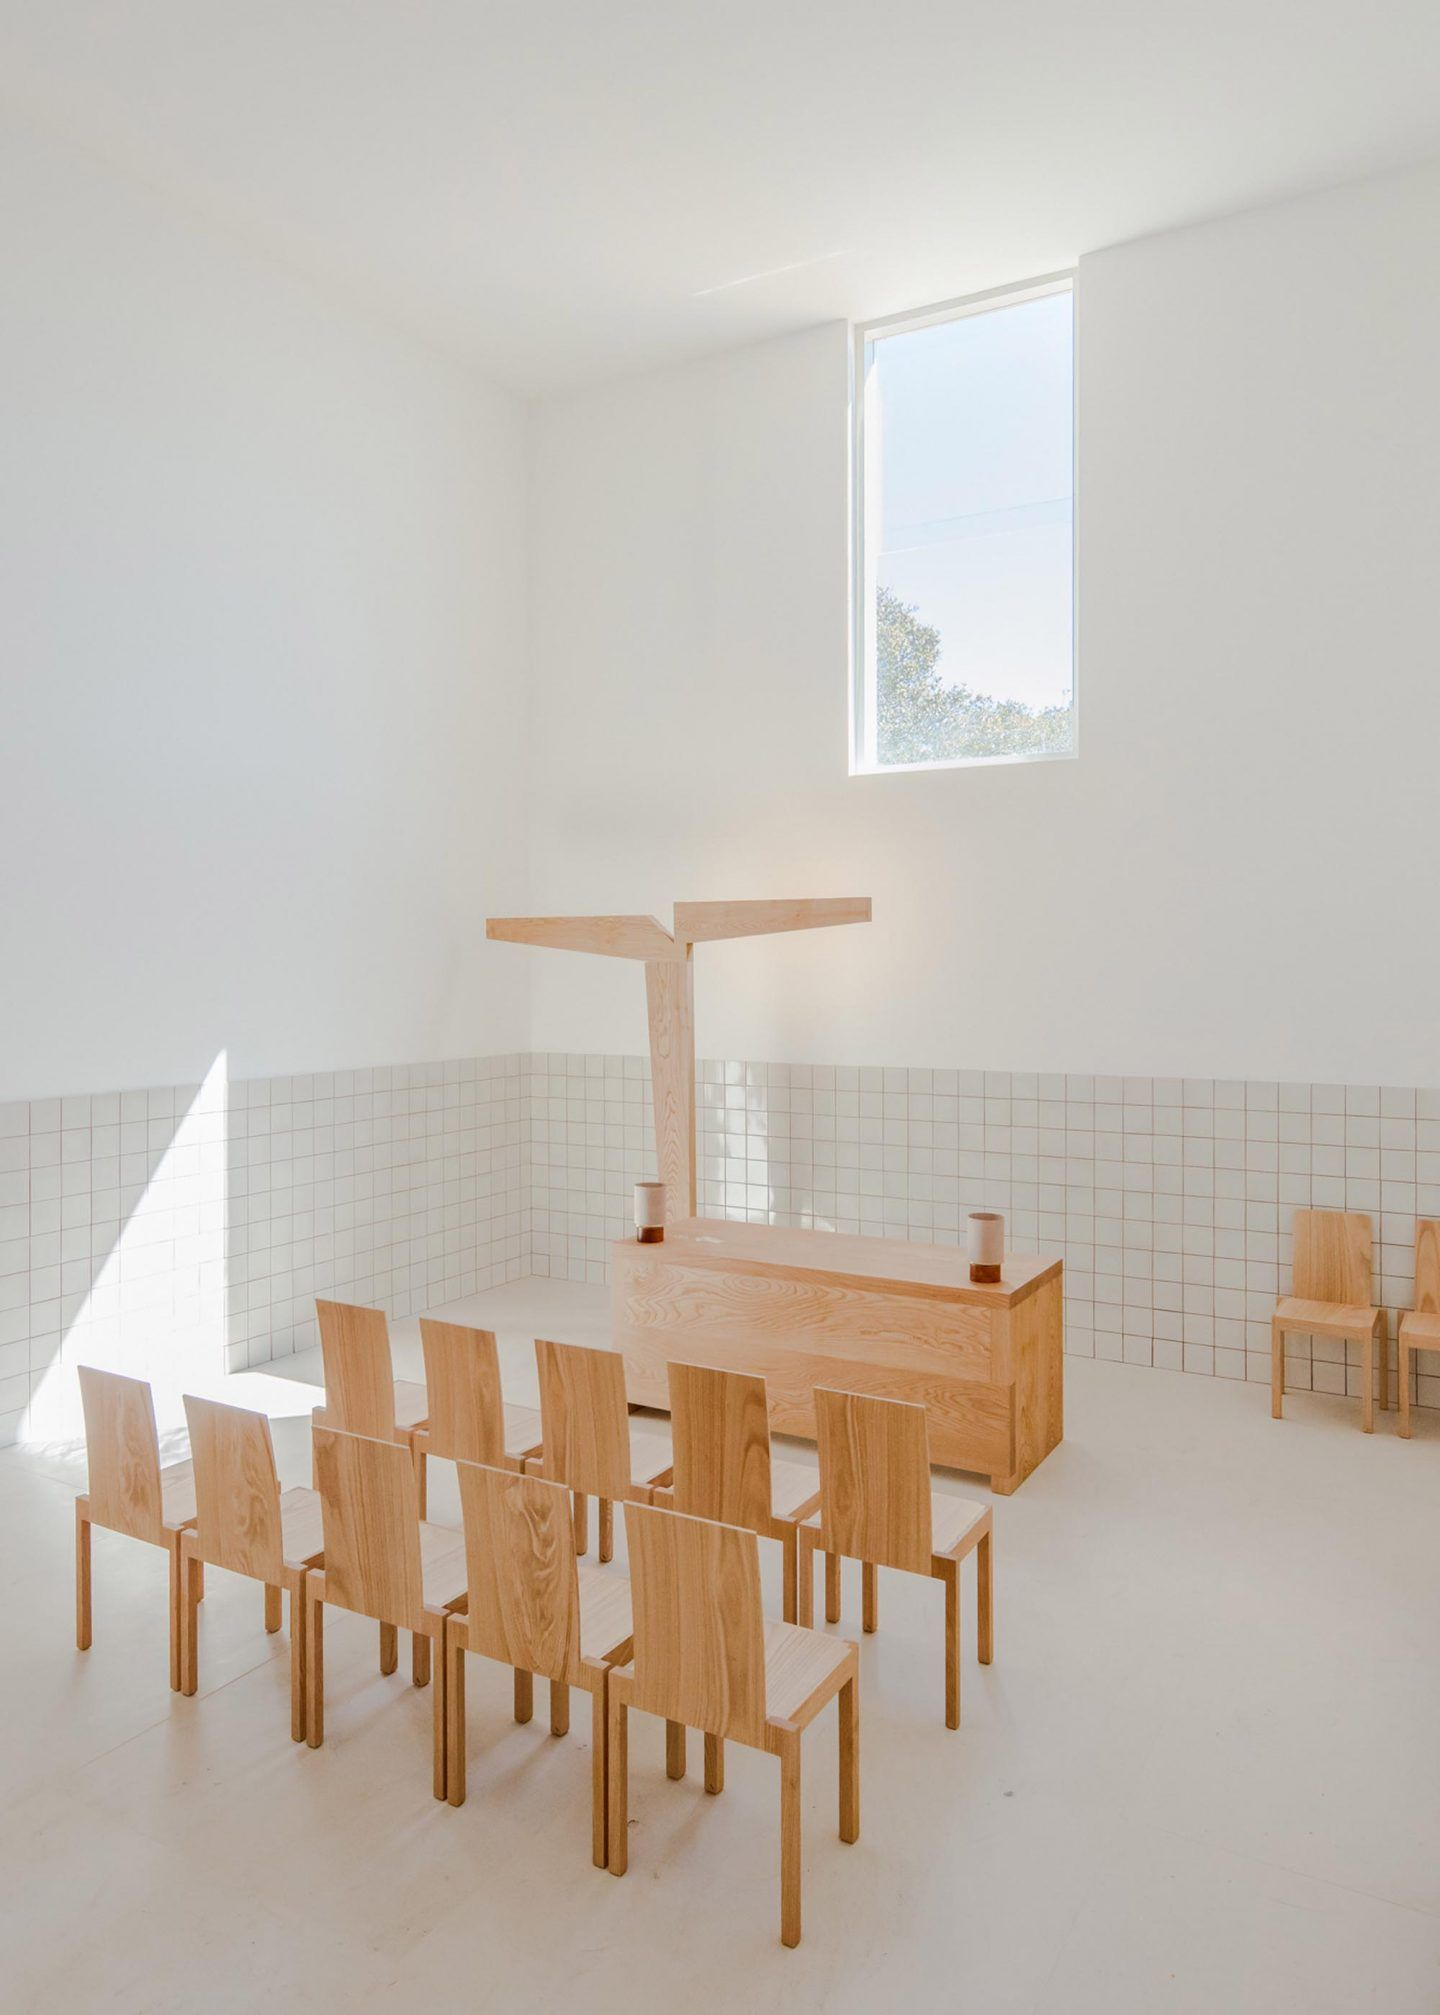 alvaro-siza-viera-capela-do-monte-chapel-algarve-dezeen-2364-col-5